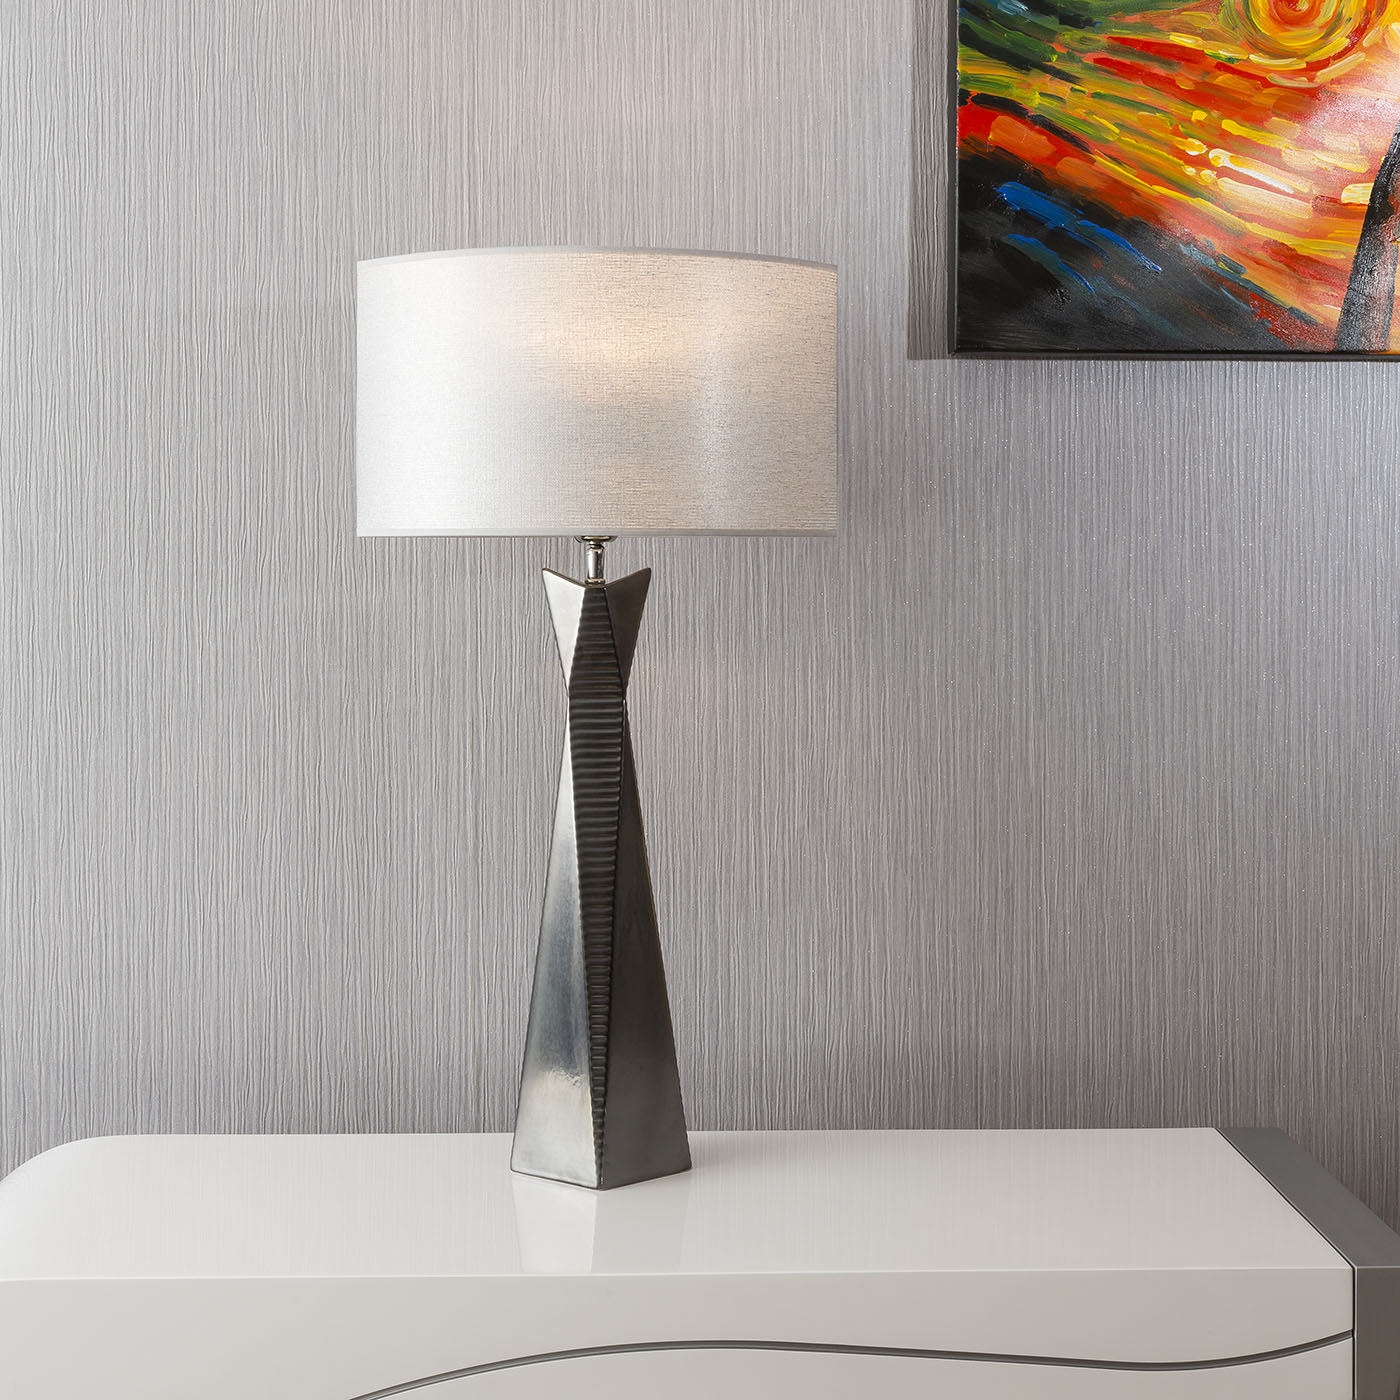 Envy Lighting High End Tall Table Lamp Ceramic Silver Base